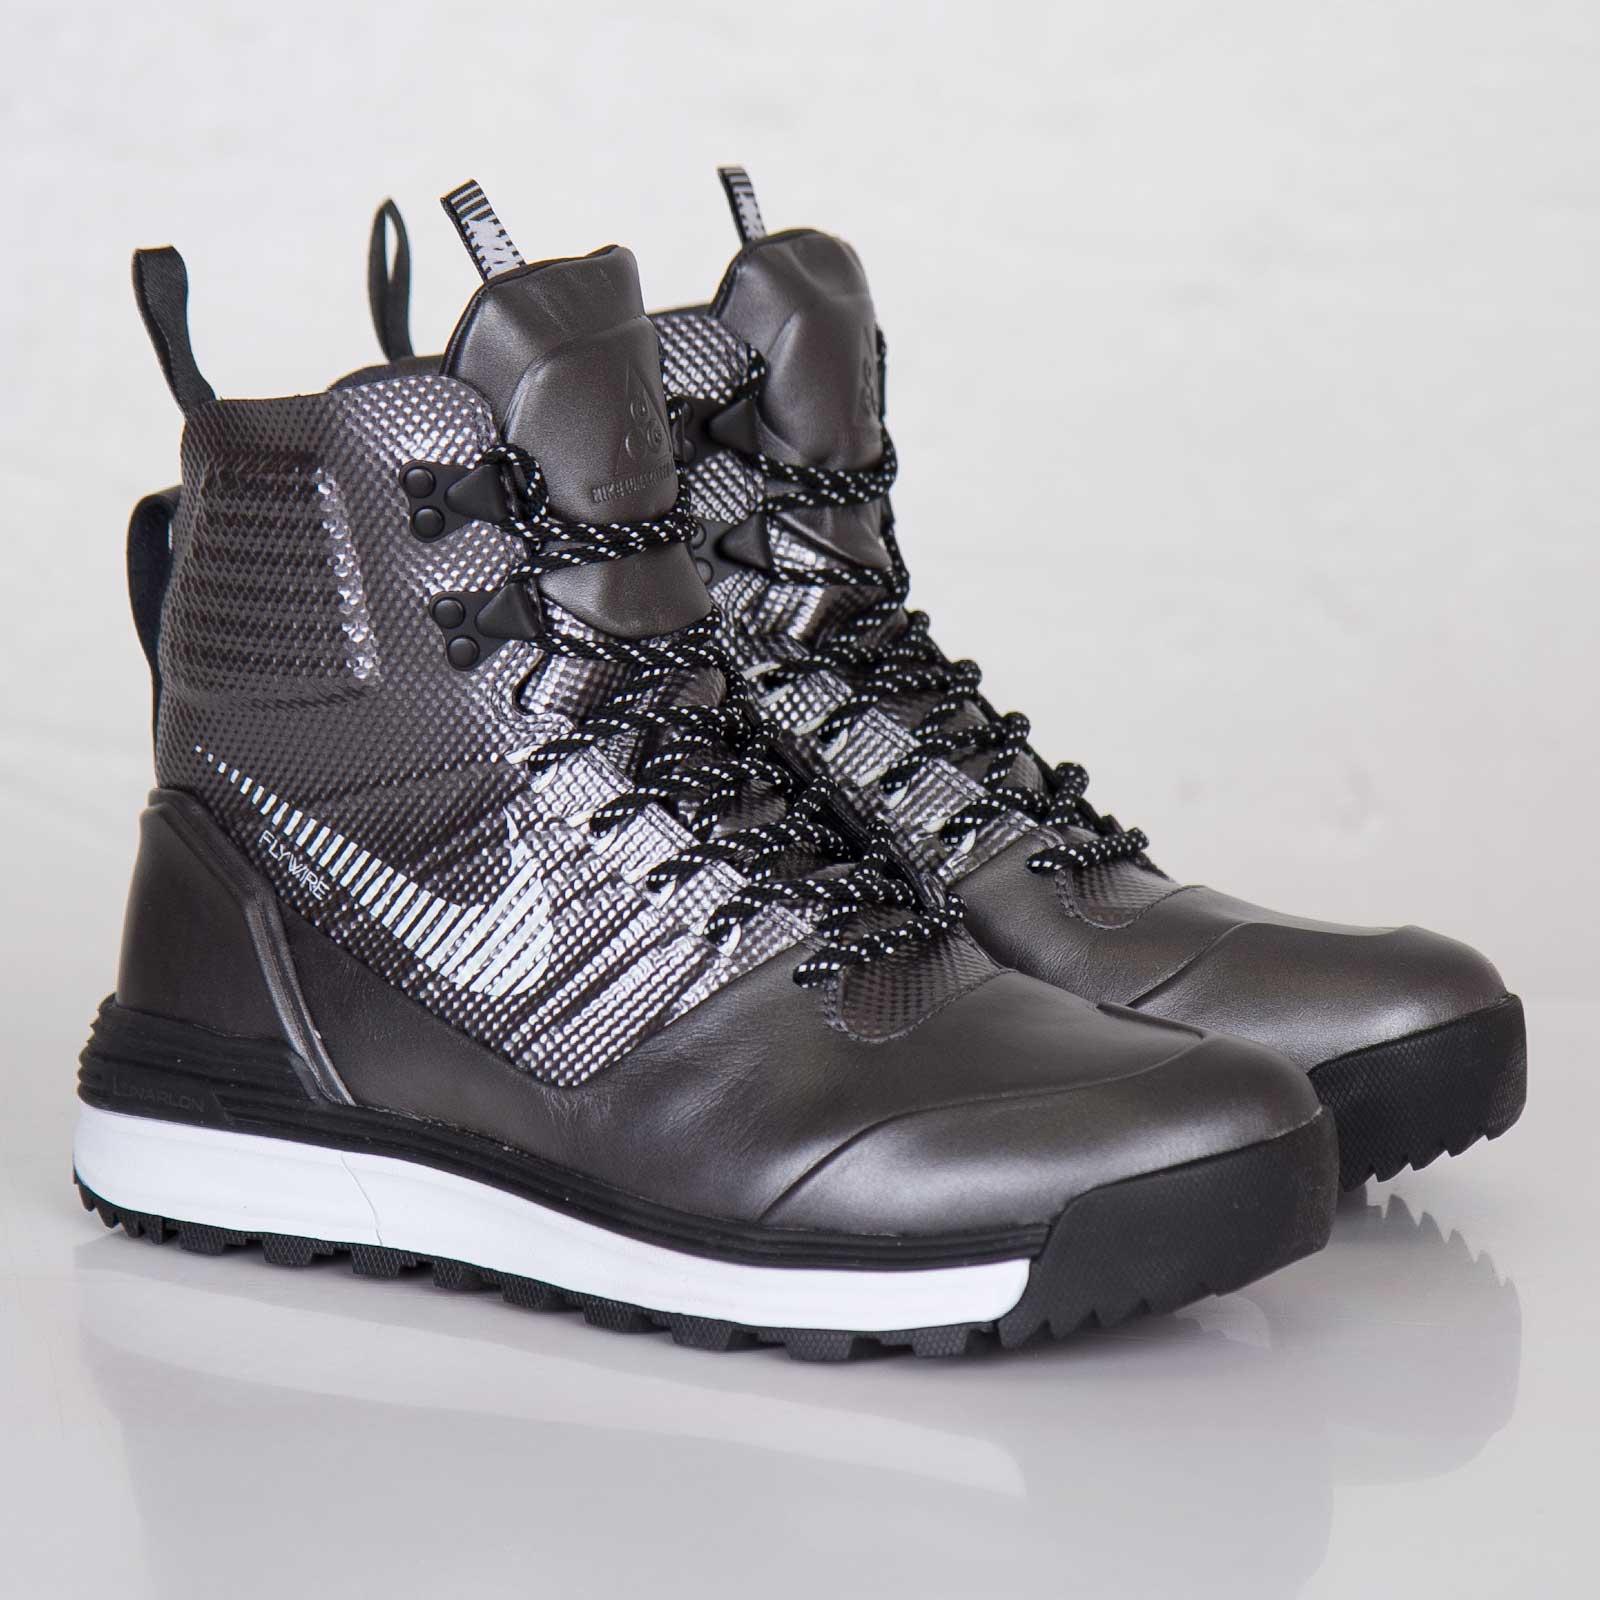 new styles 7649e 92763 Nike Lunarterra Arktos QS